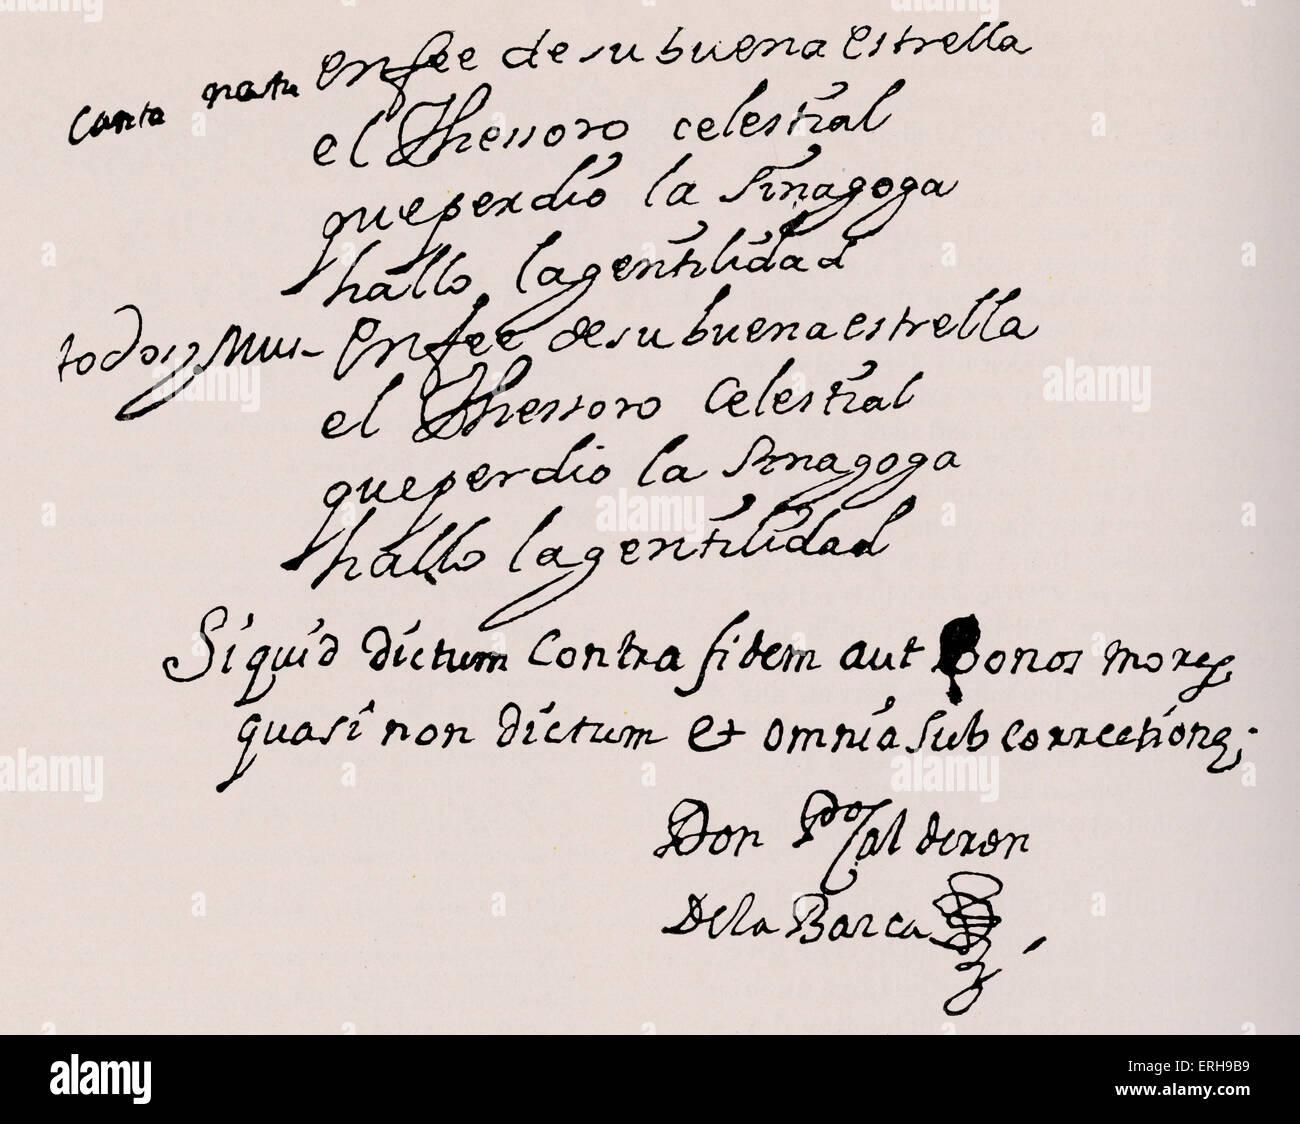 Pedro Calderón de la Barca 's signature at the bottom of manuscript page of 'Tesoro Escondido'. - Stock Image